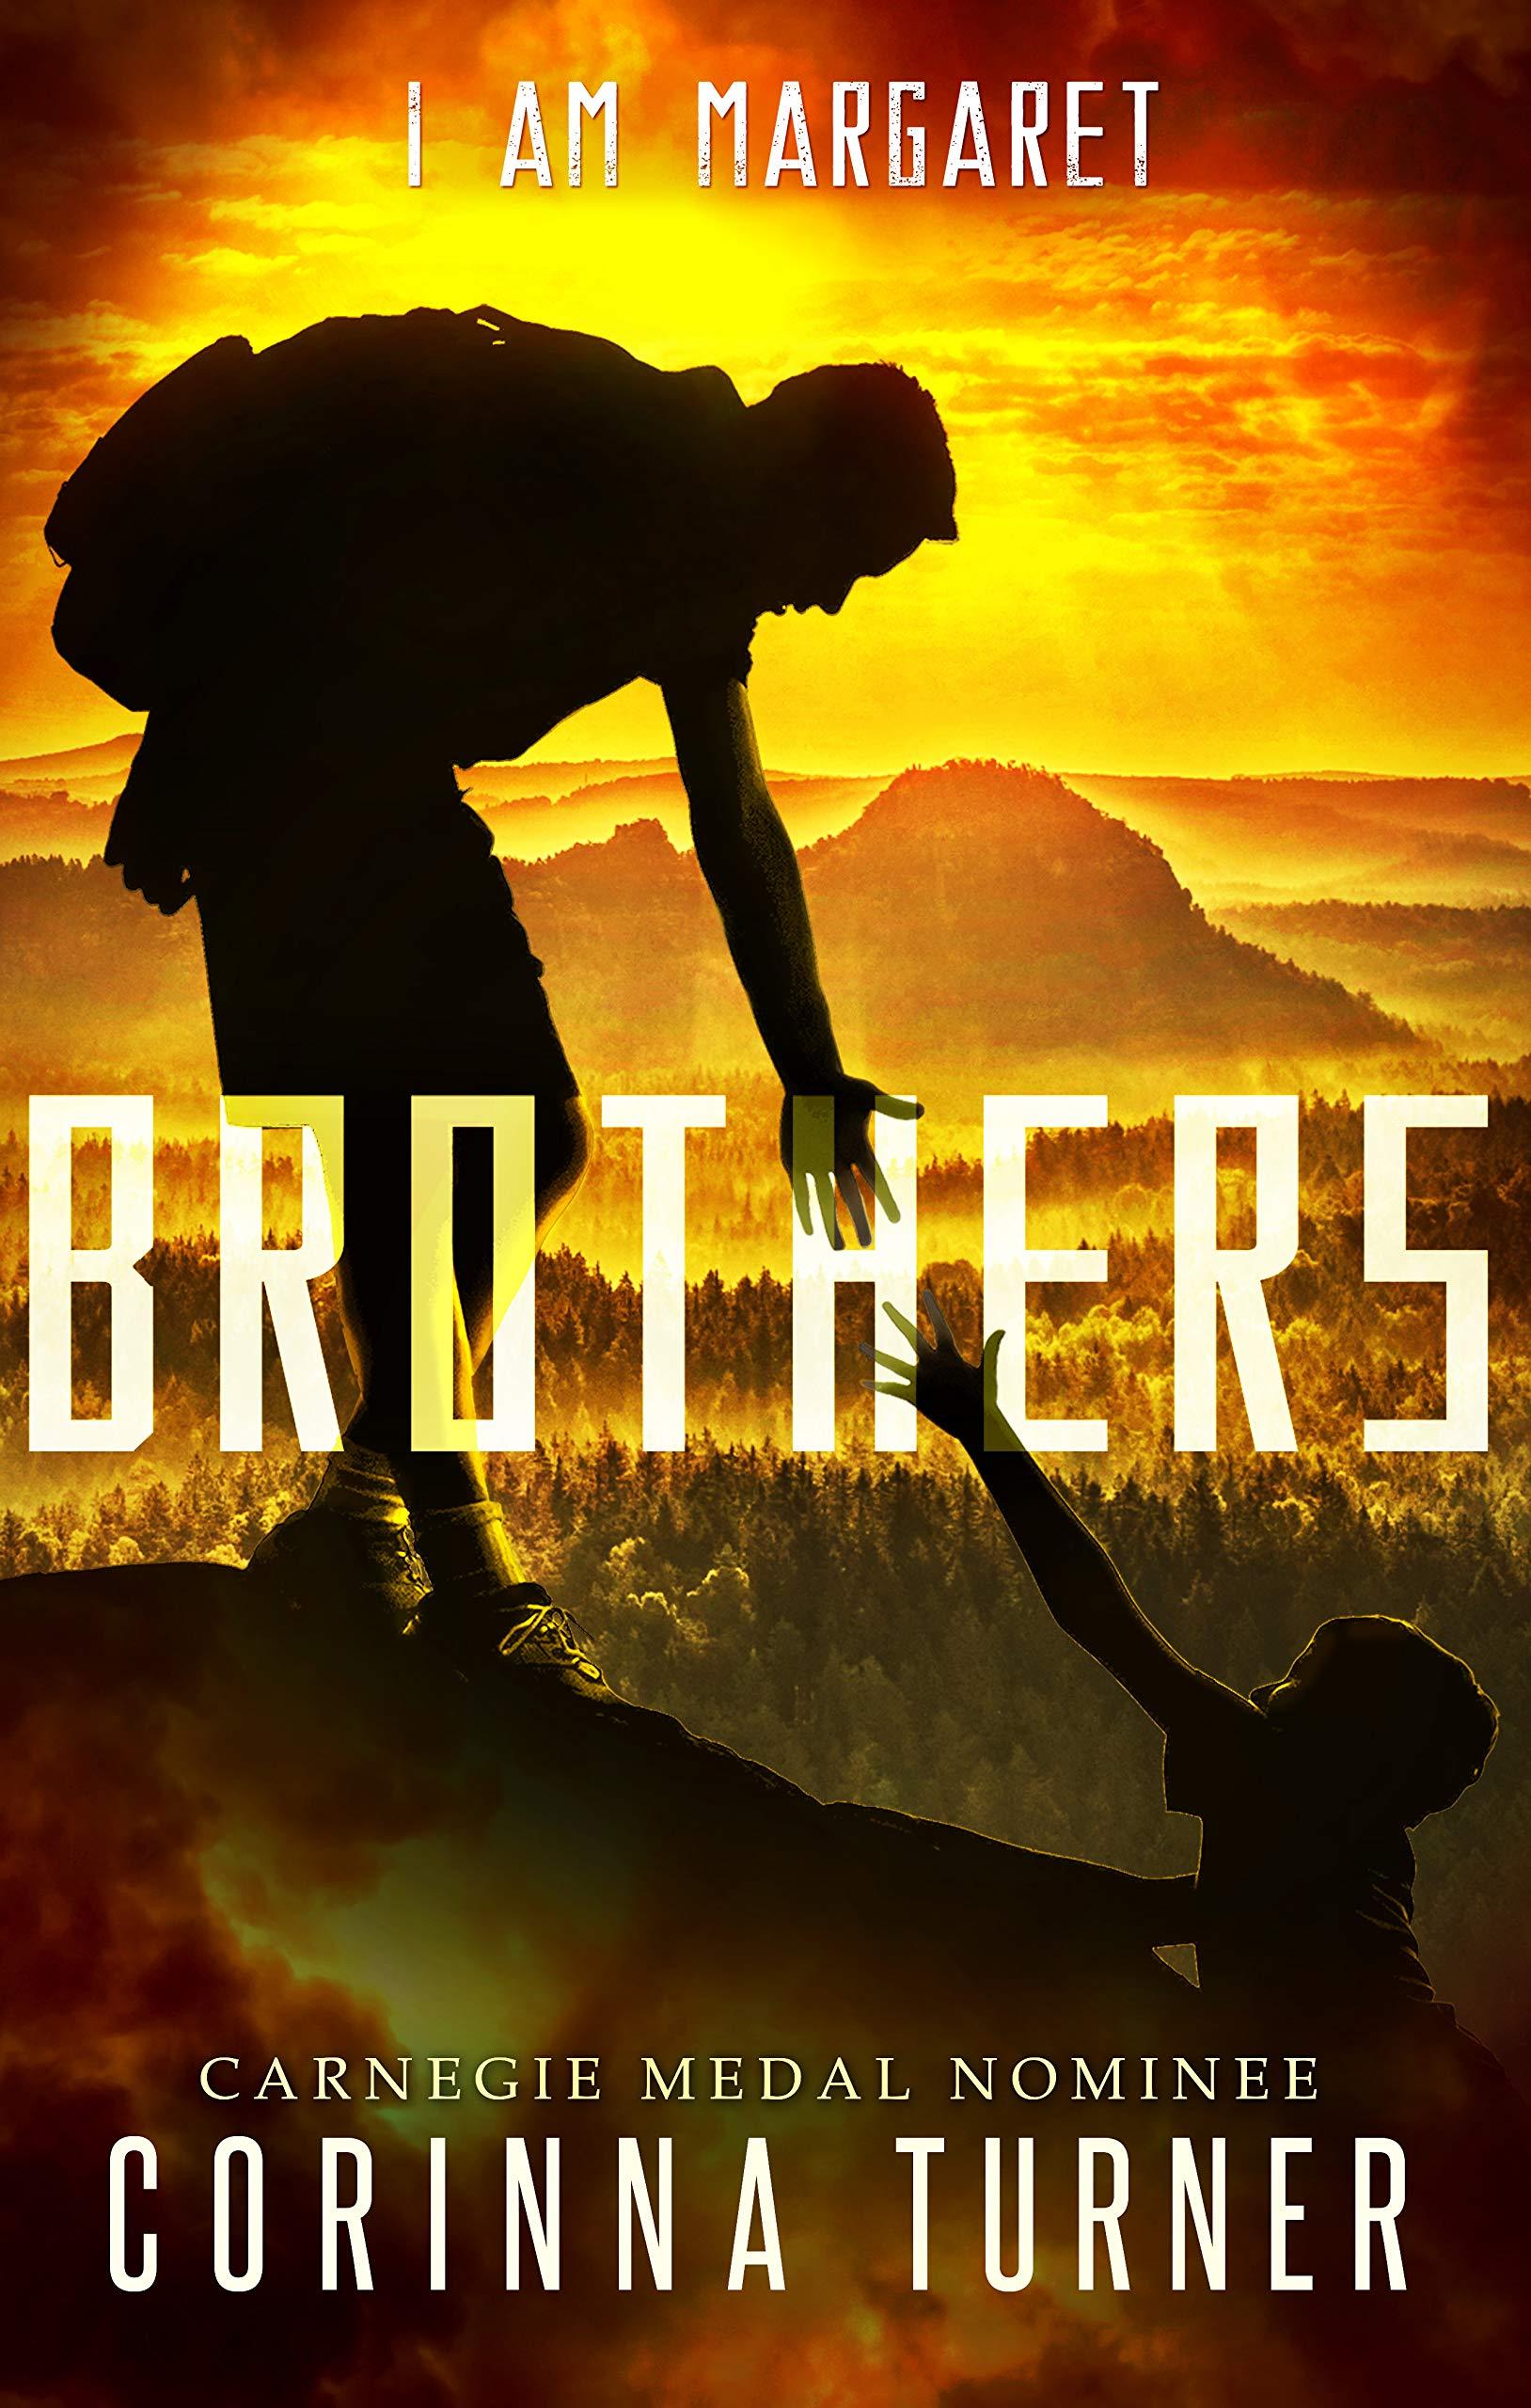 Brothers: A Short Prequel Novella (UK Edition) (I Am Margaret Book 0) (English Edition)